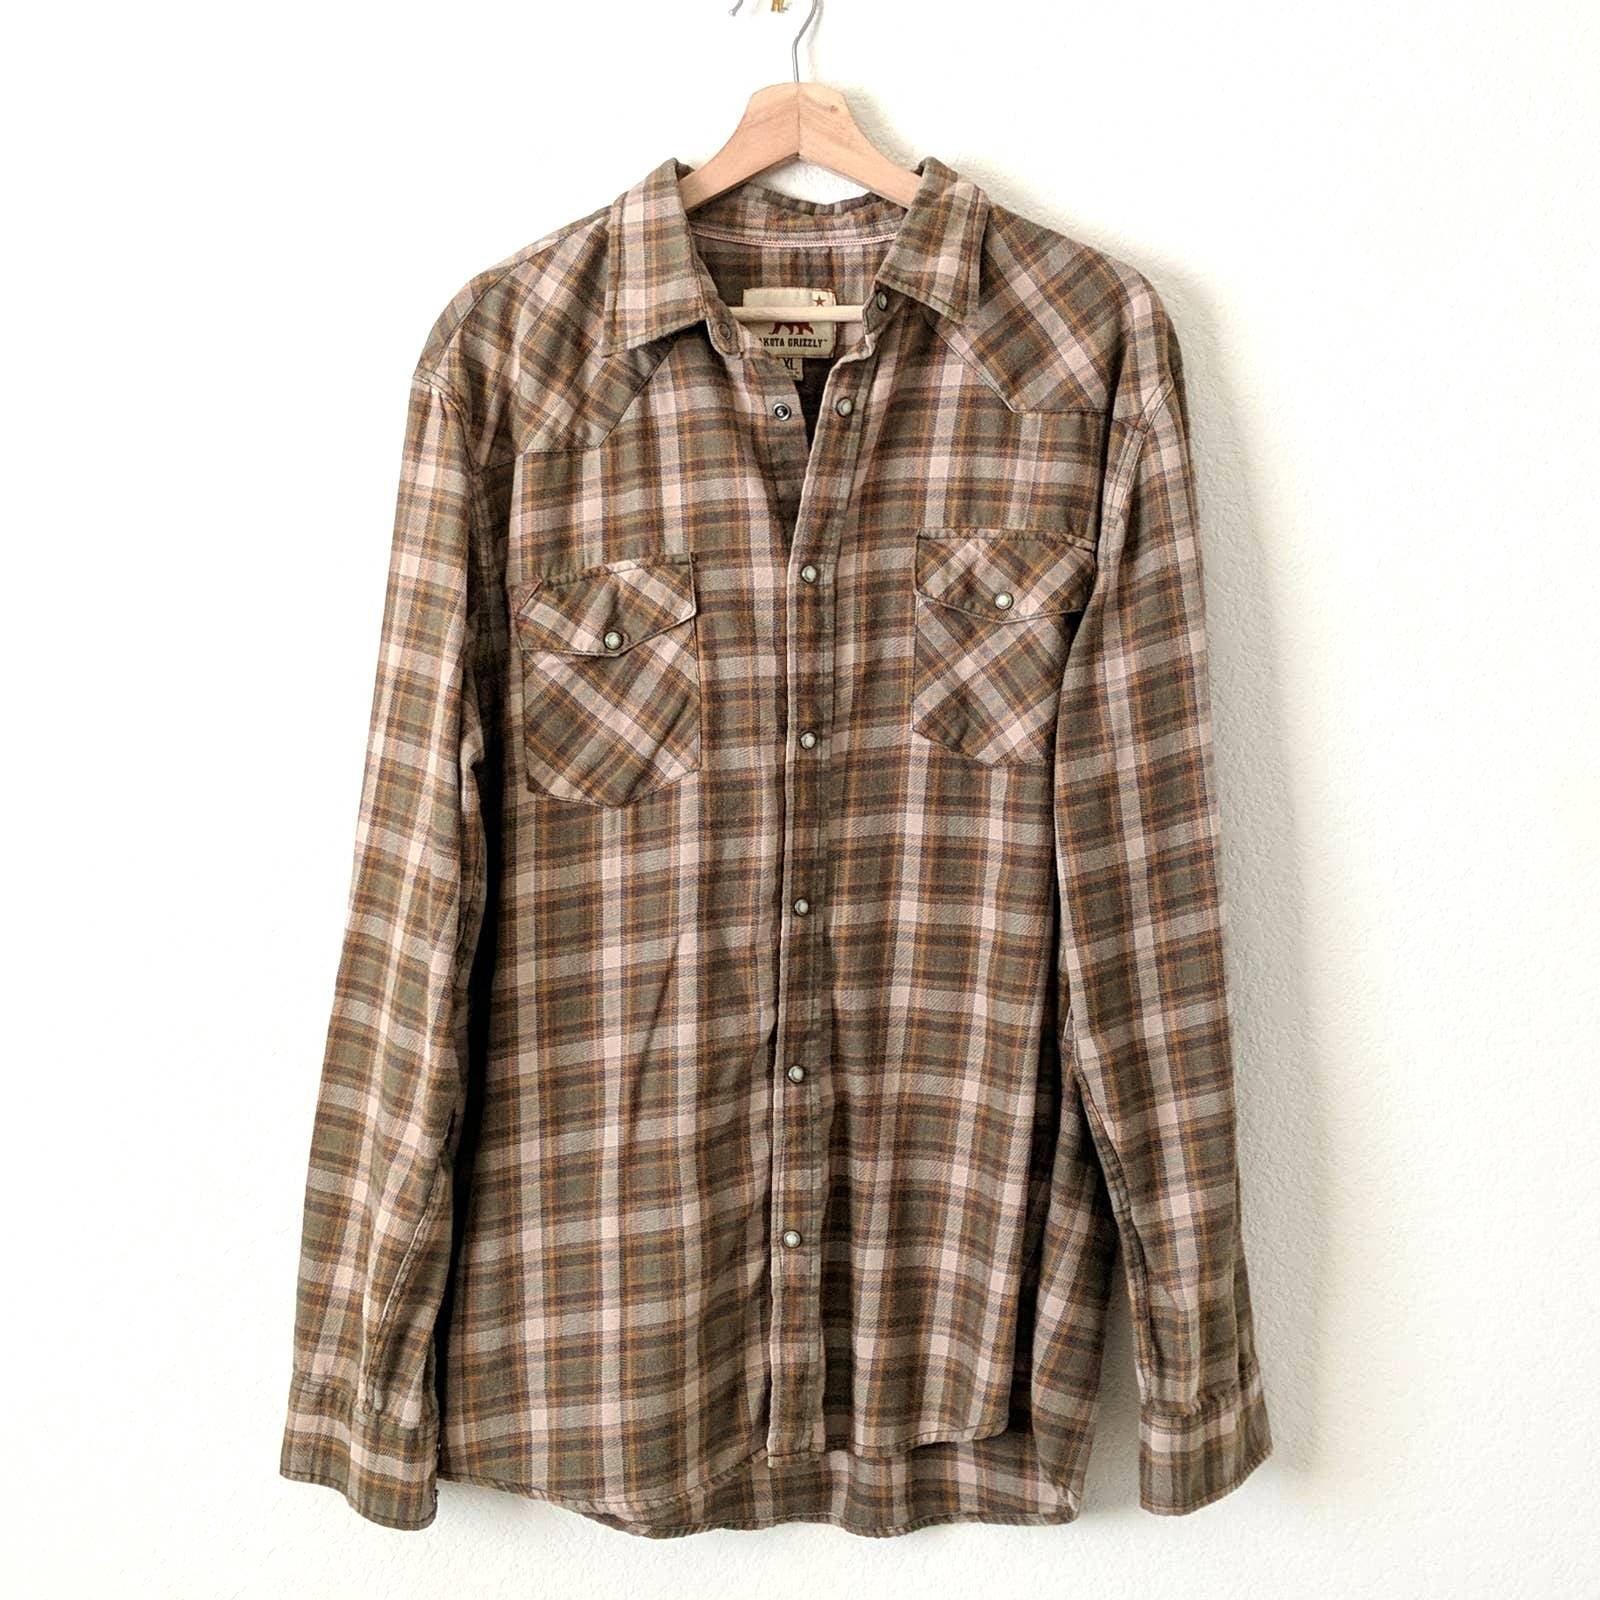 Dakota Grizzly Plaid Pearl Snap Shirt XL